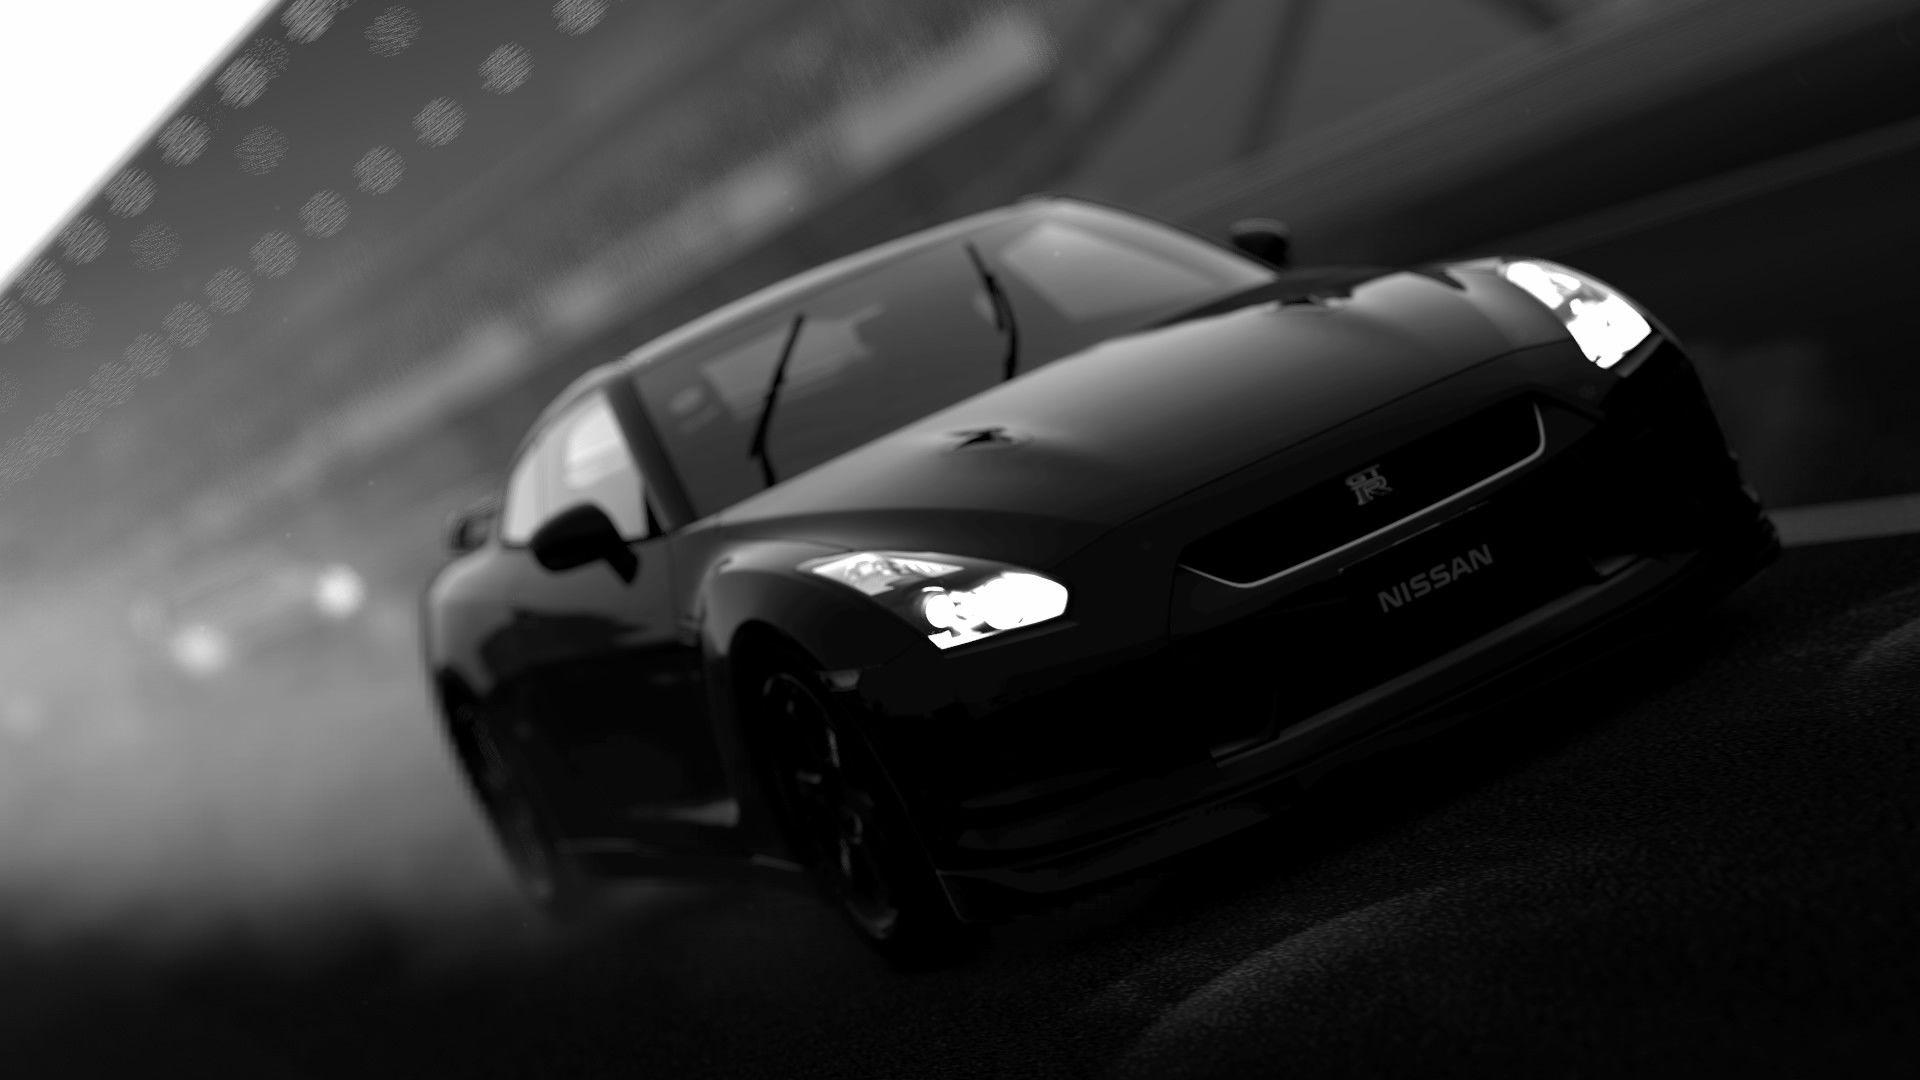 Superieur Black Cars Wallpaper #7031539